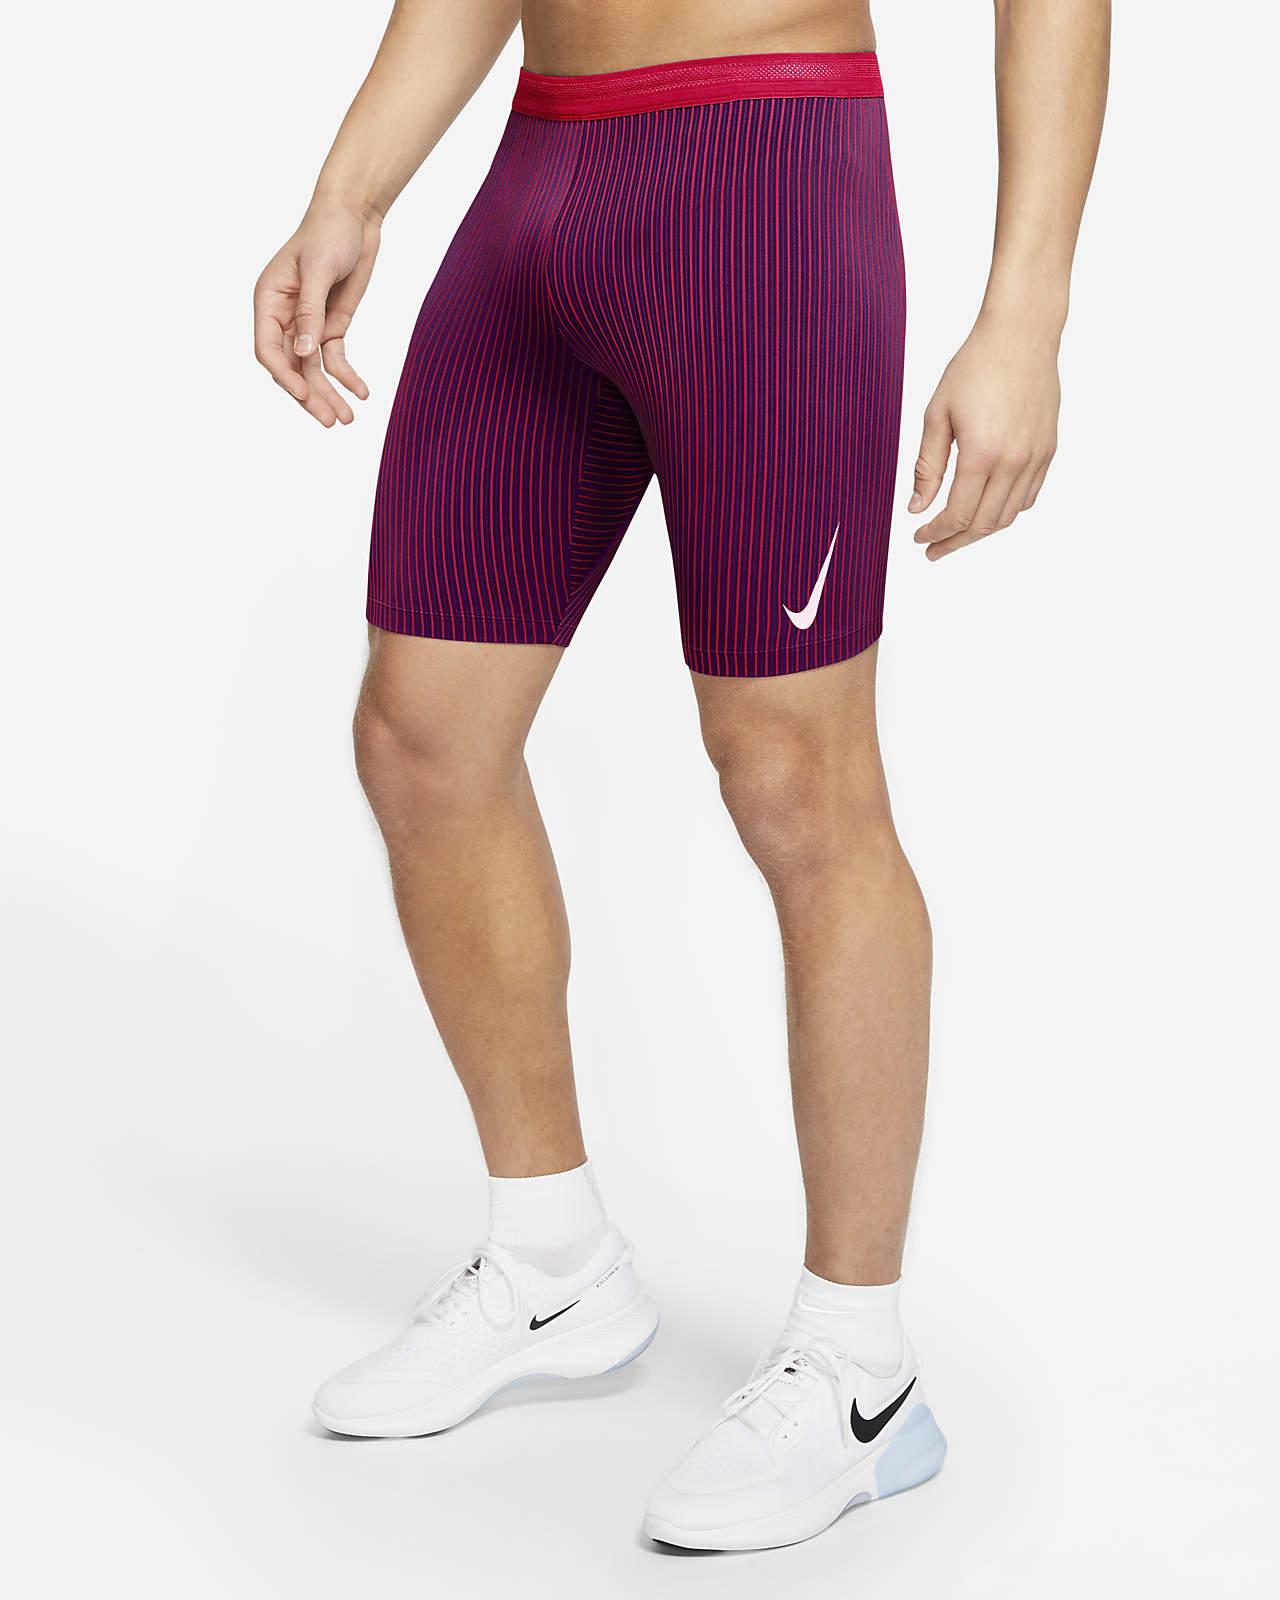 Nike AeroSwift Men's 1/2-Length Running Tights